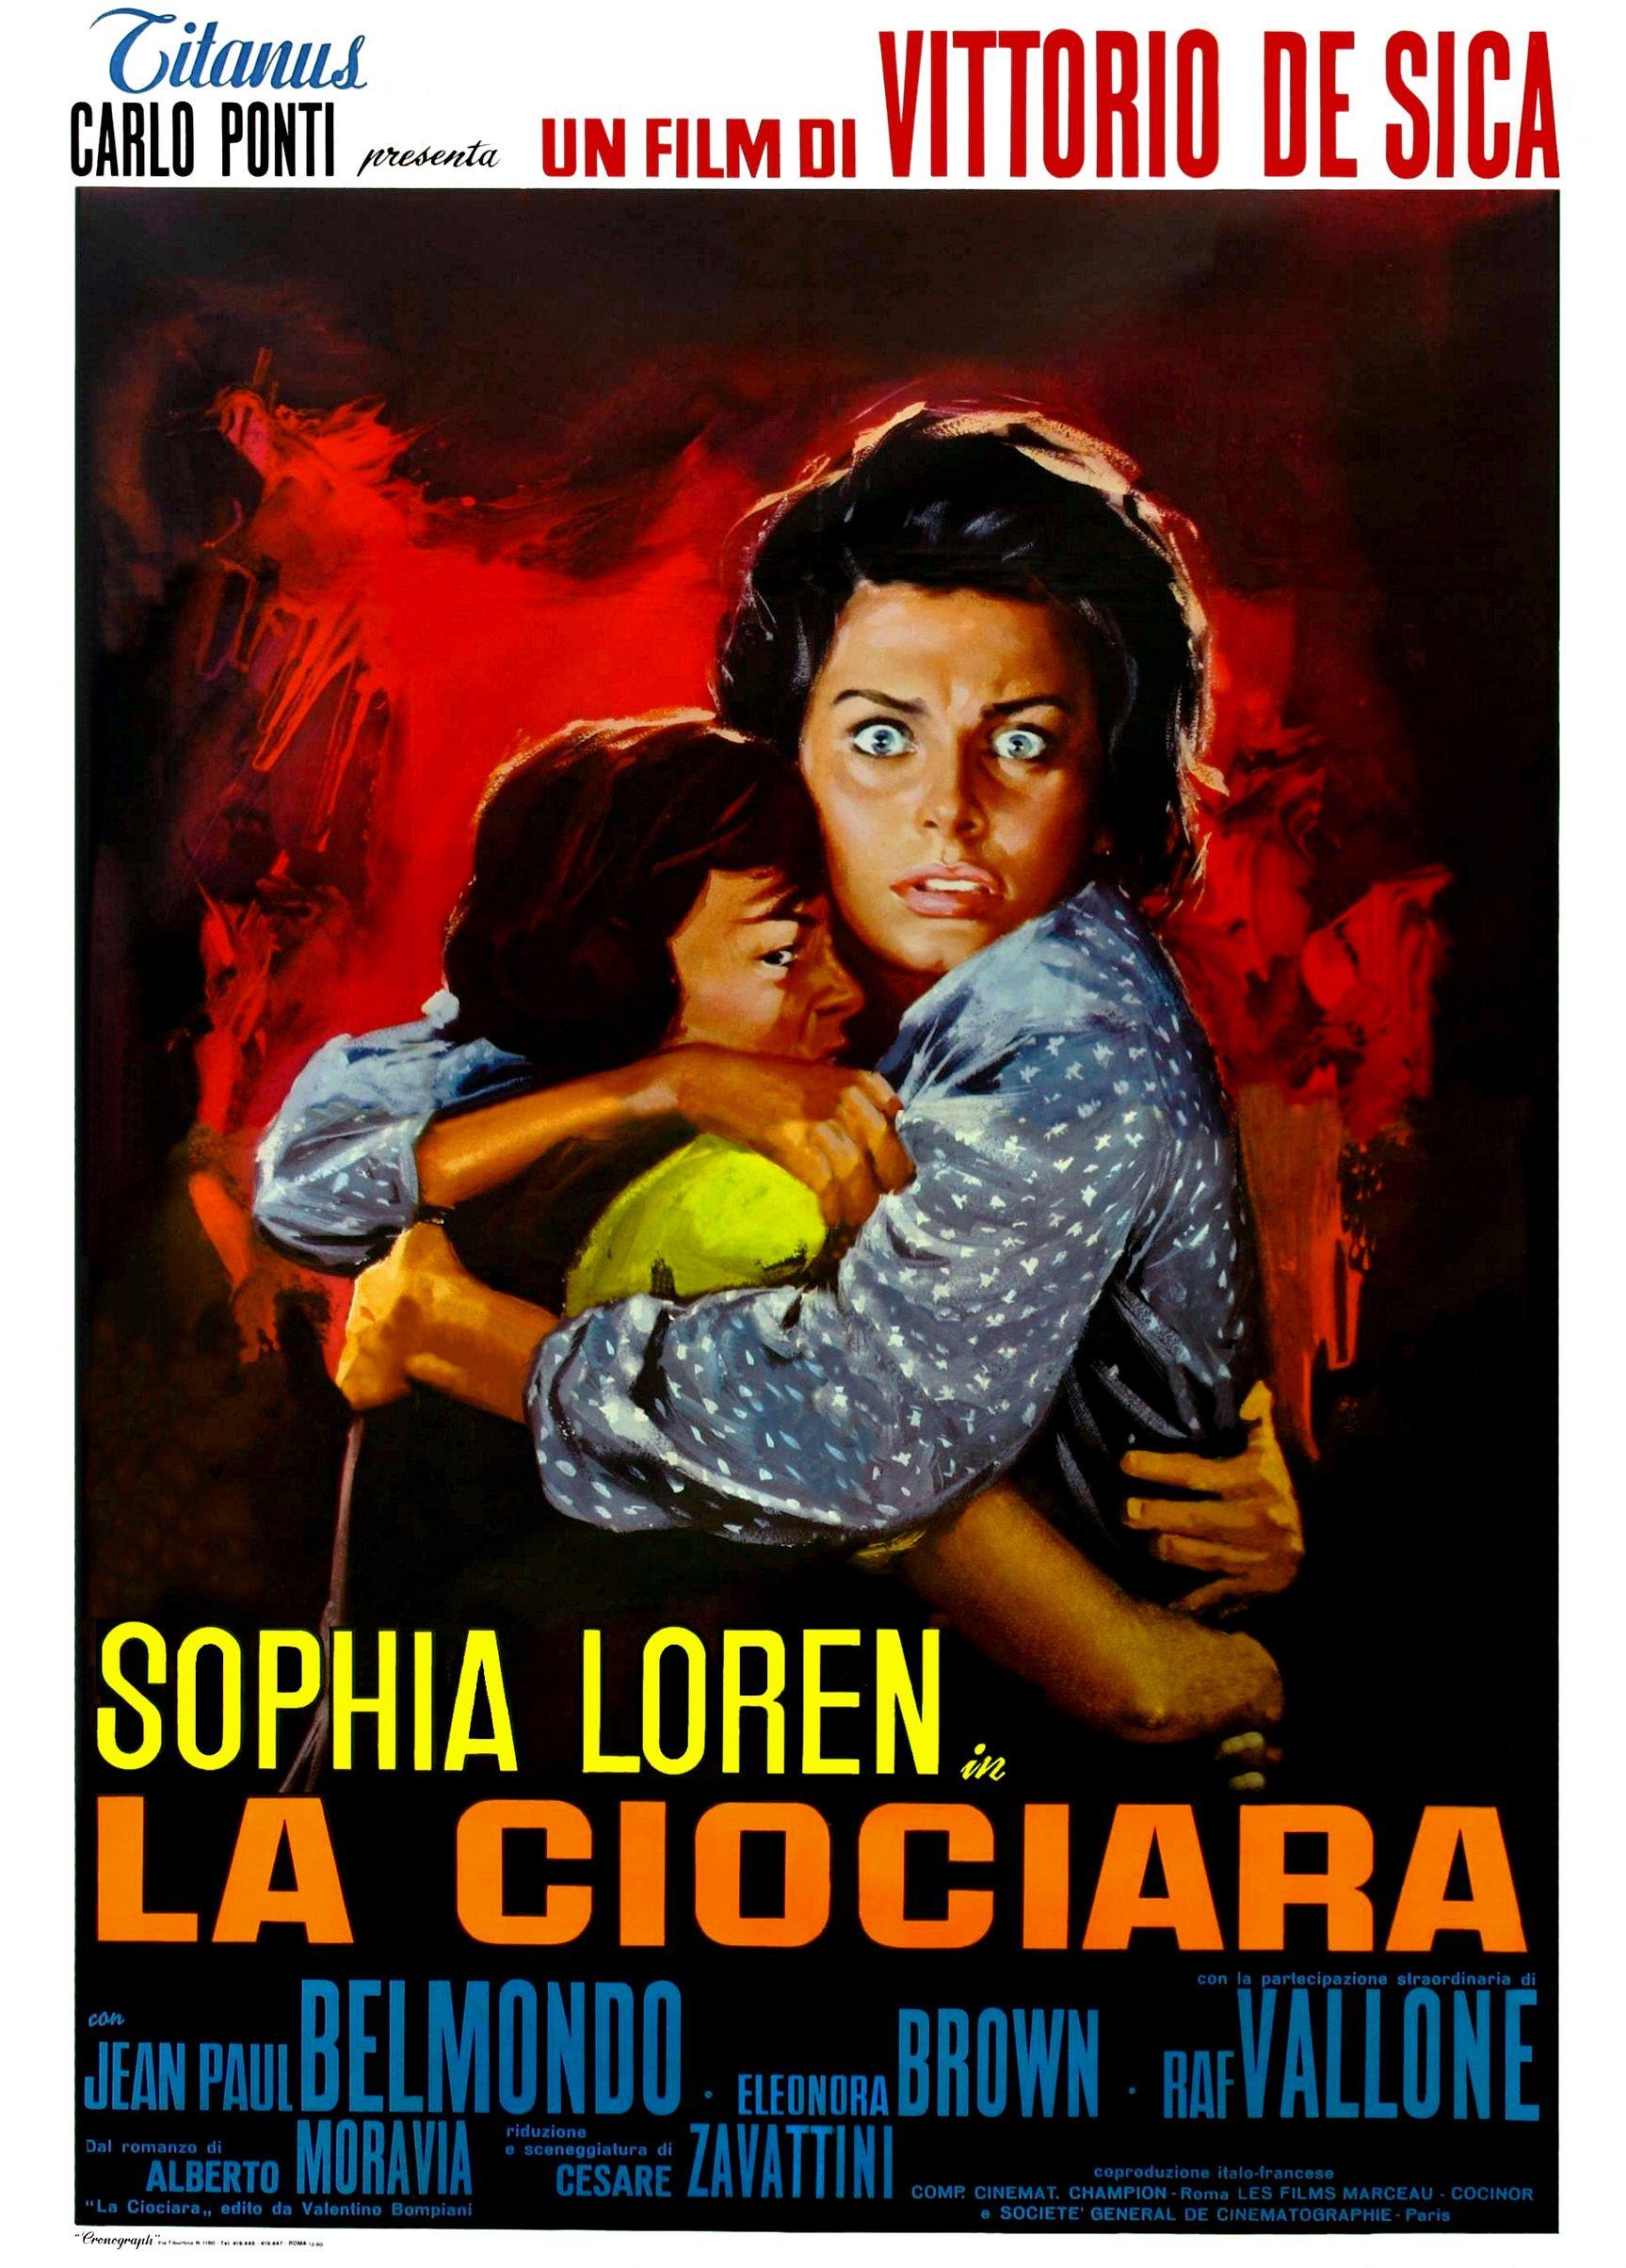 Votre dernier film visionné - Page 17 La_Ciociara